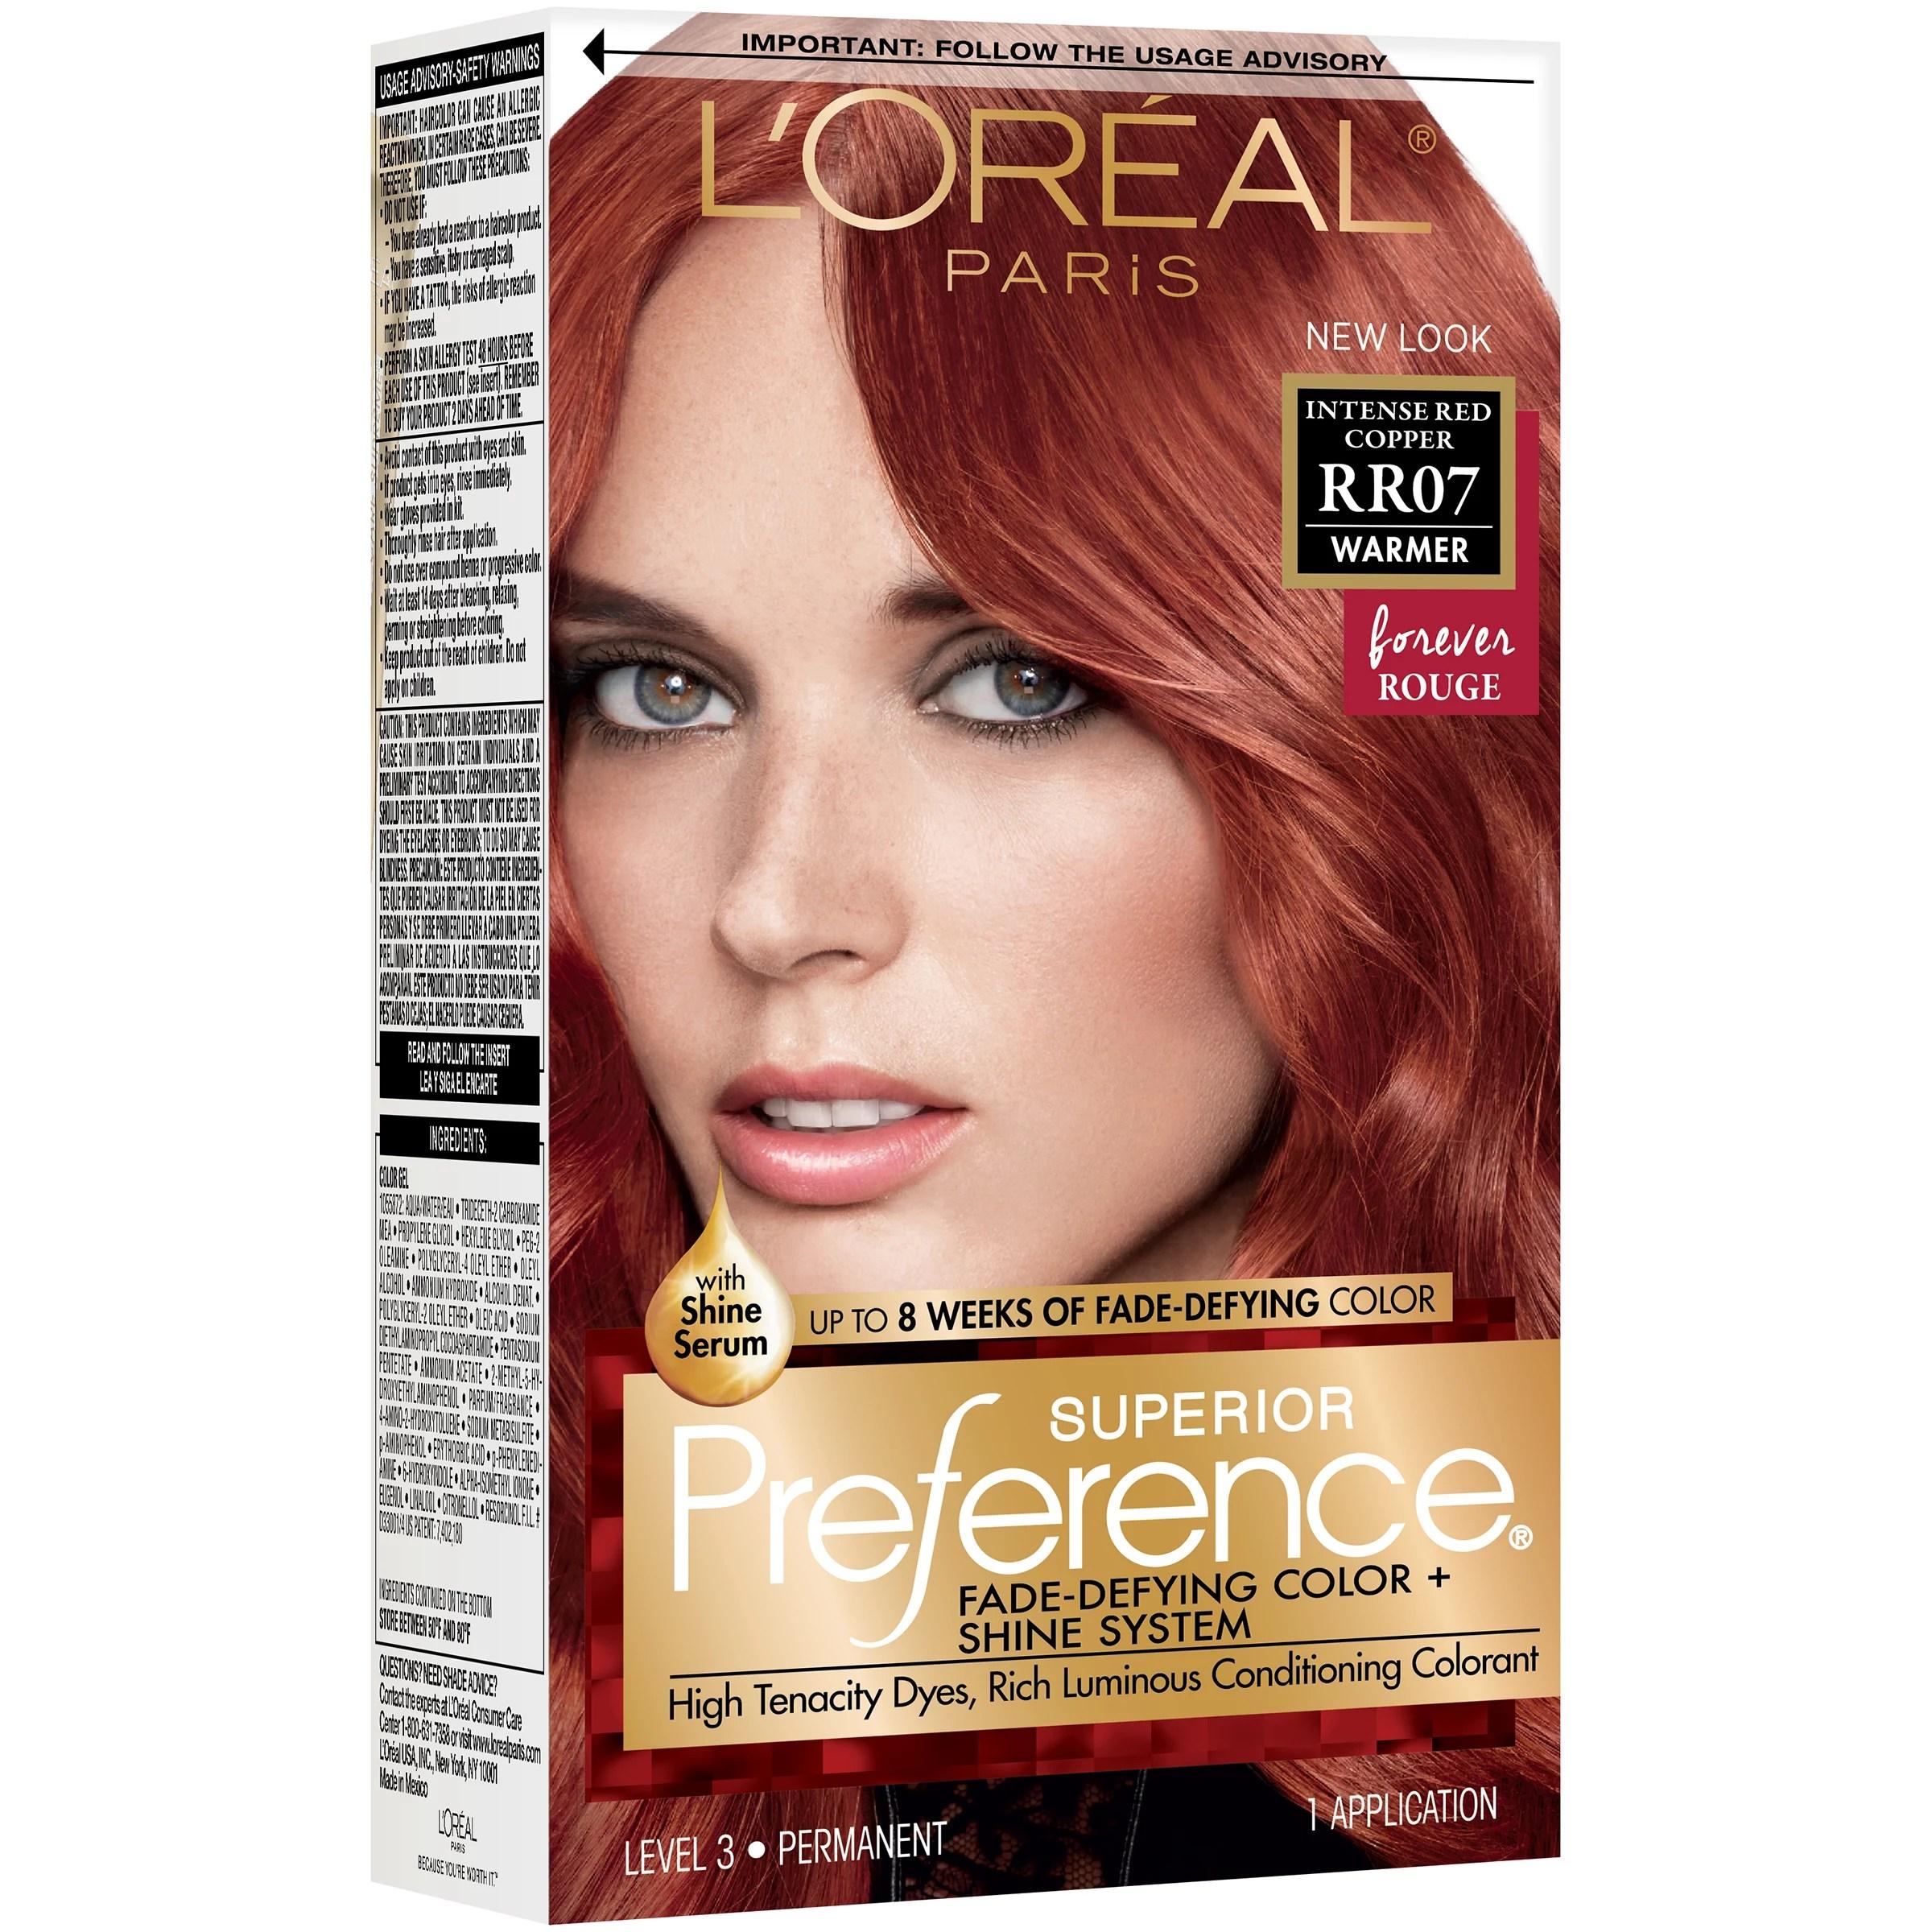 L Oreal Paris Superior Preference Permanent Hair Color Rr 07 Intense Red Copper Shop Hair Color At H E B